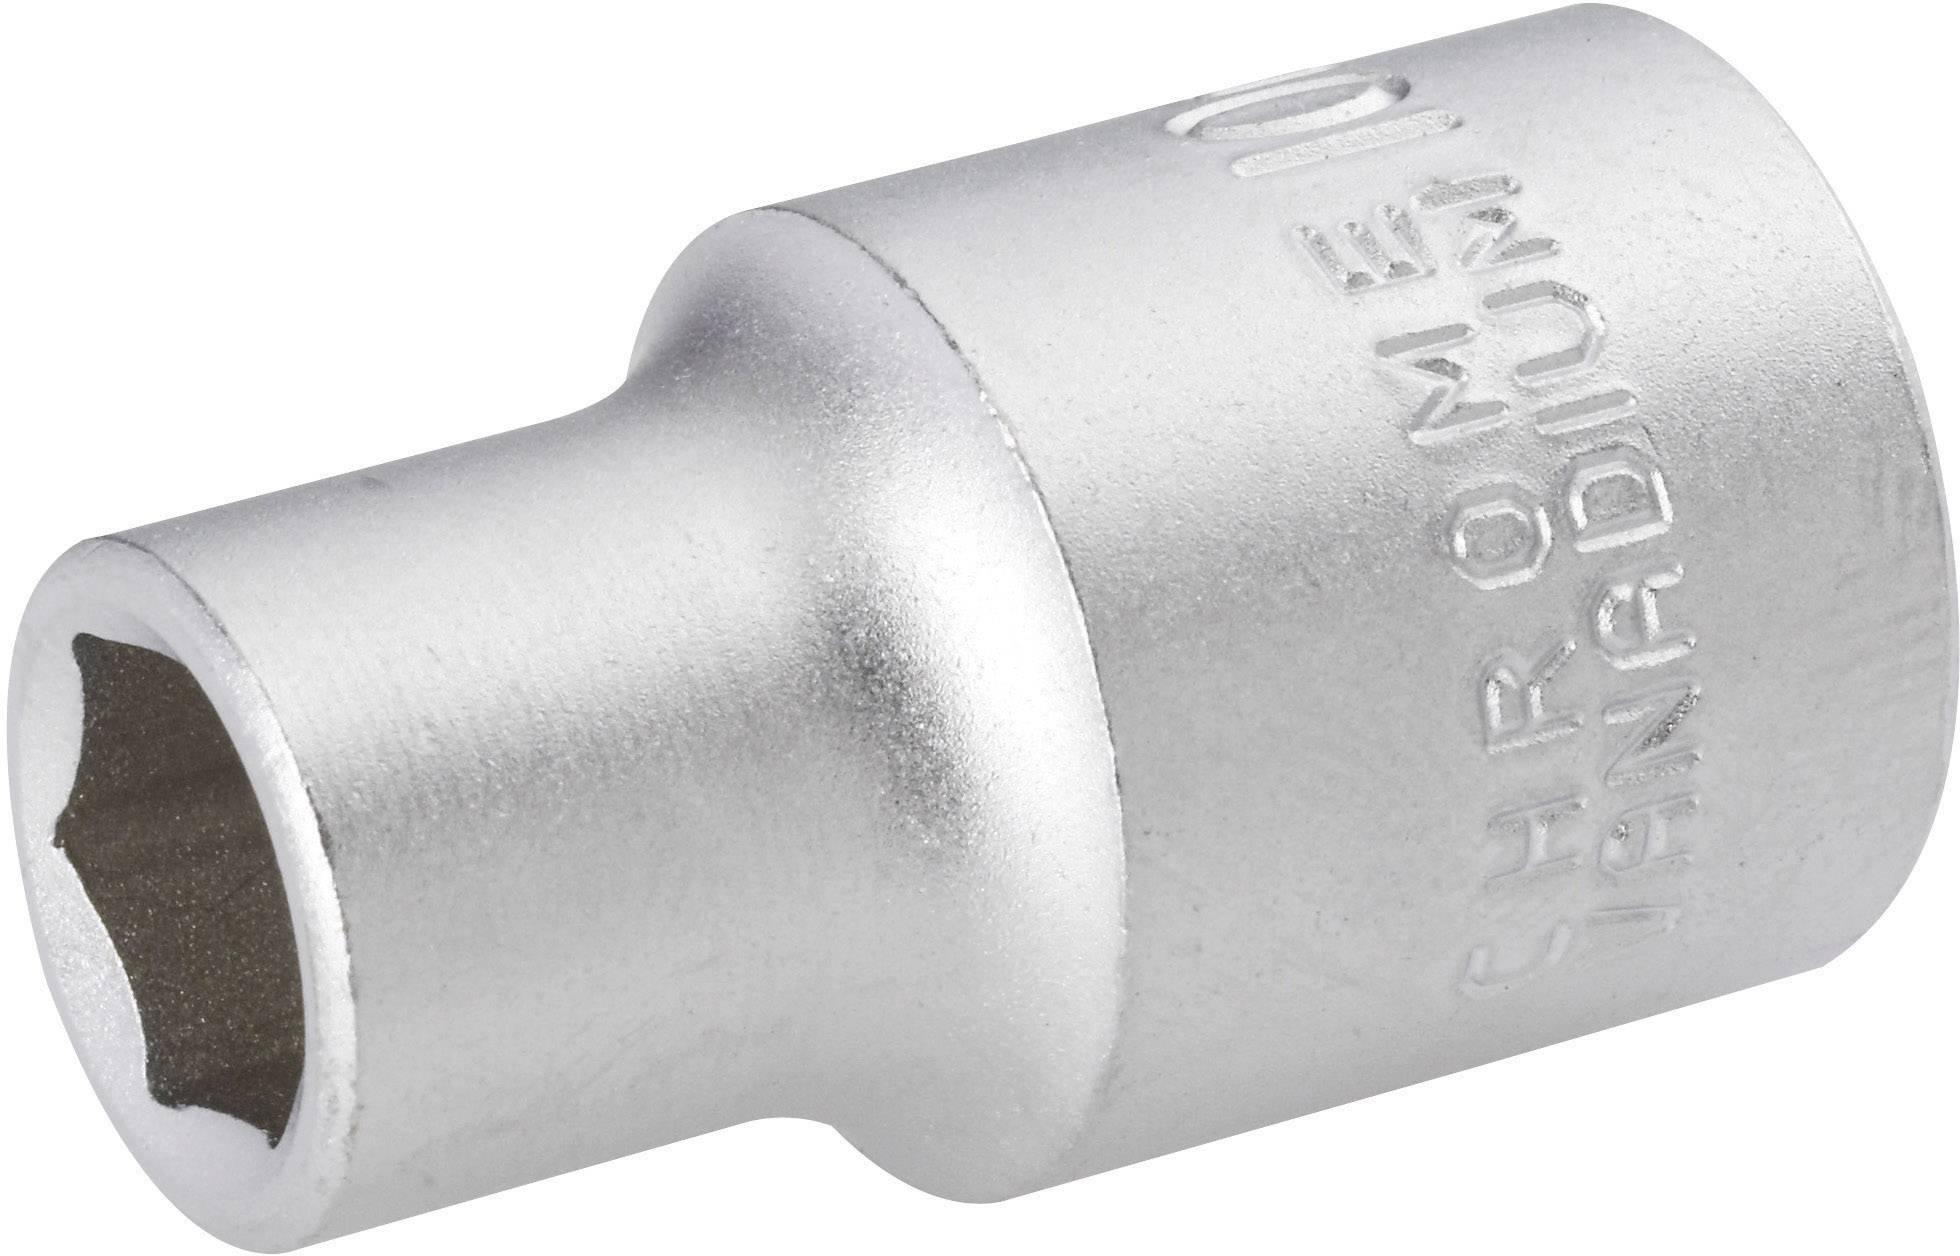 "Nadstavec na račňu TOOLCRAFT 820769, 1/2"" (12.5 mm), 15 mm"